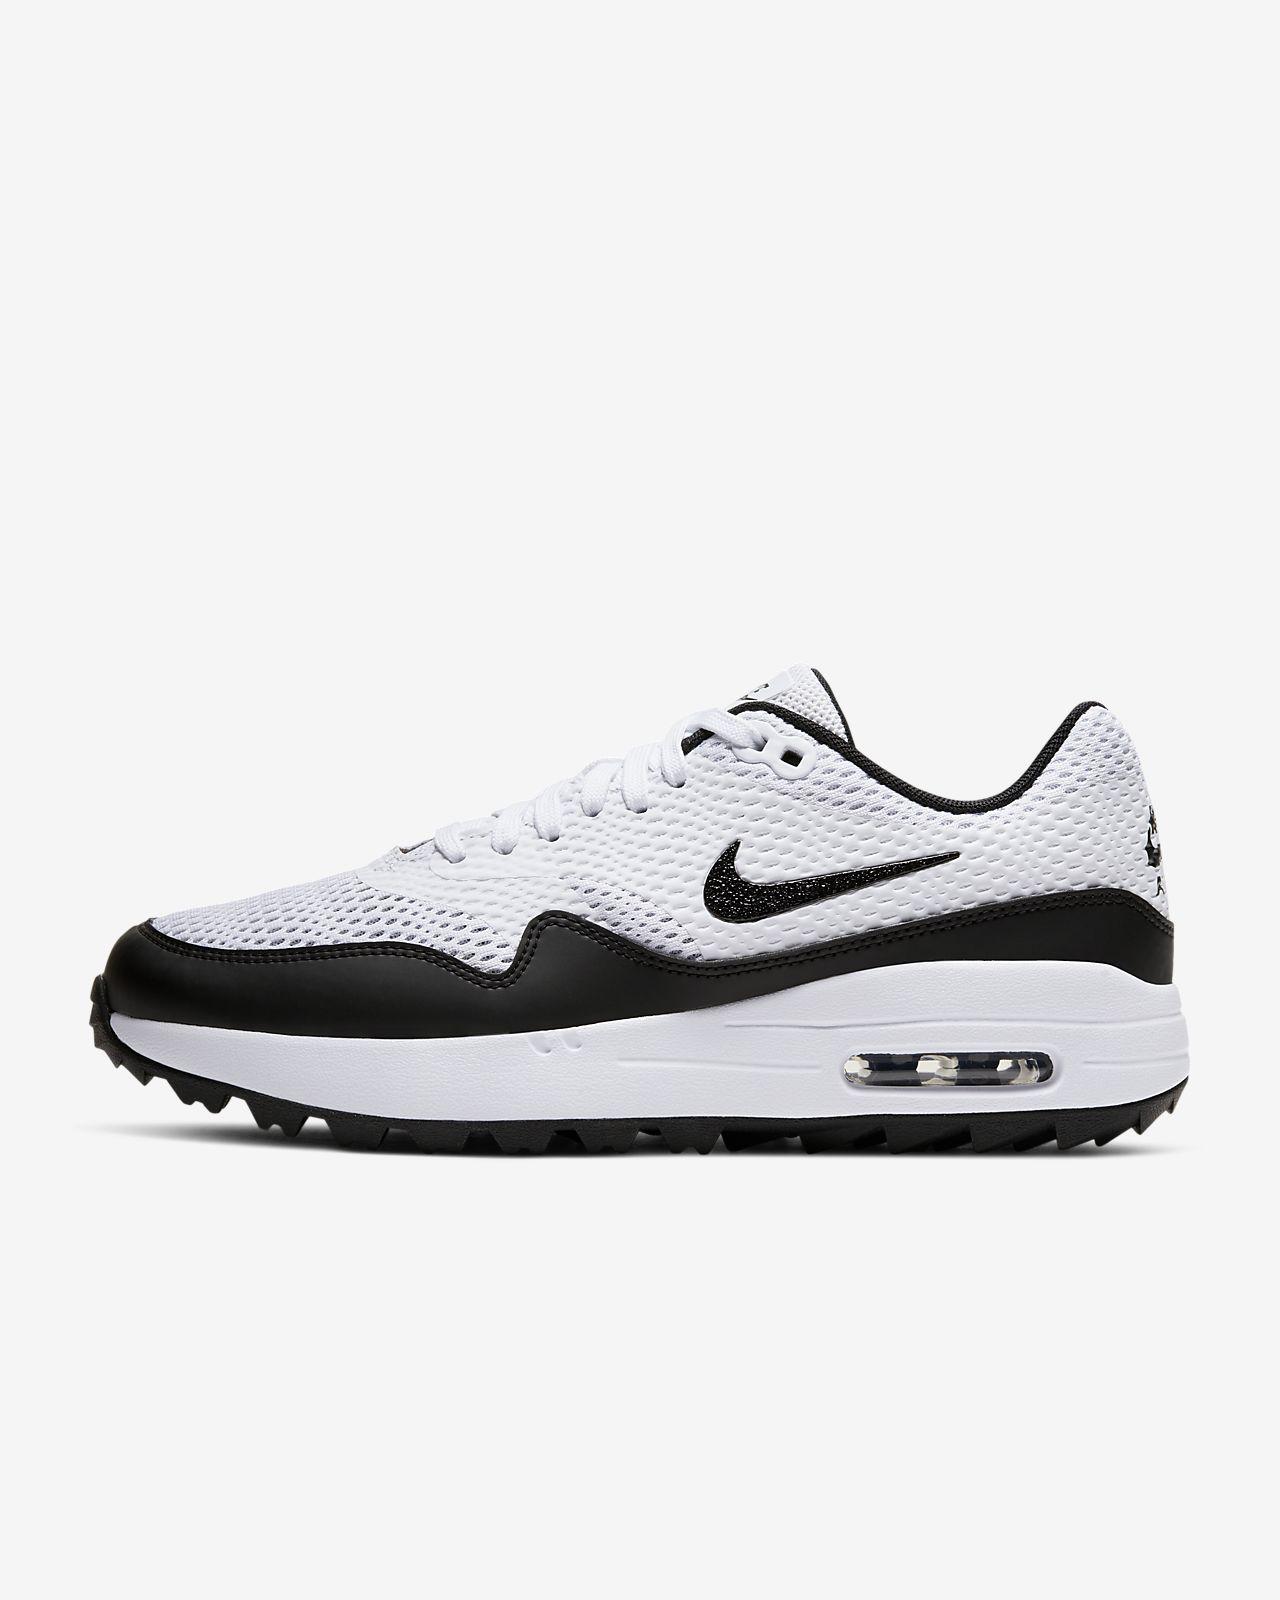 Nike Air Max 1 G Zapatillas de golf Mujer